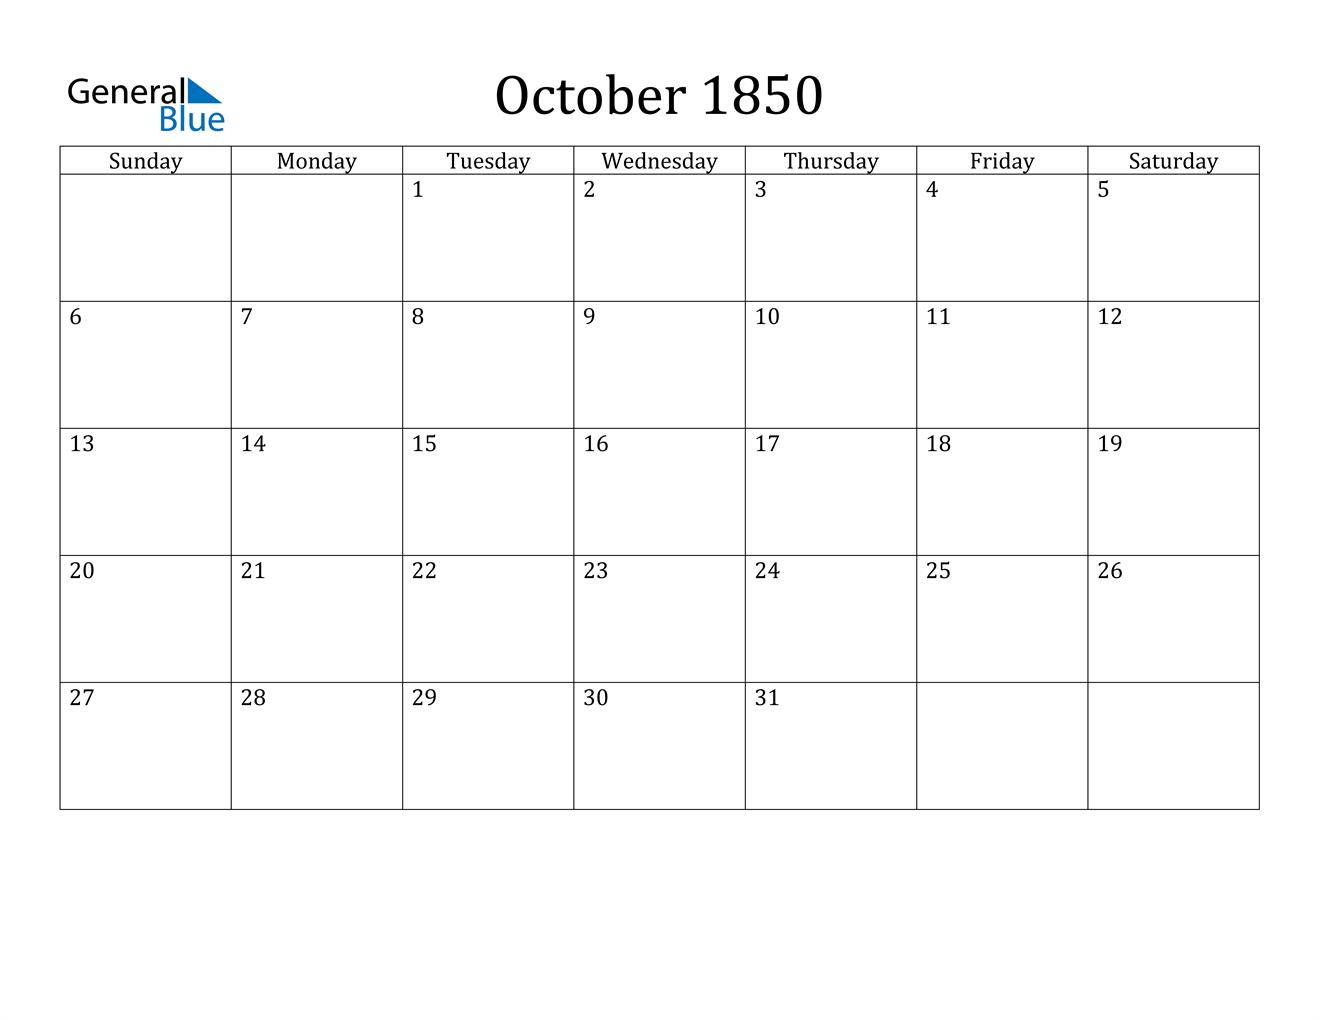 Image of October 1850 Calendar